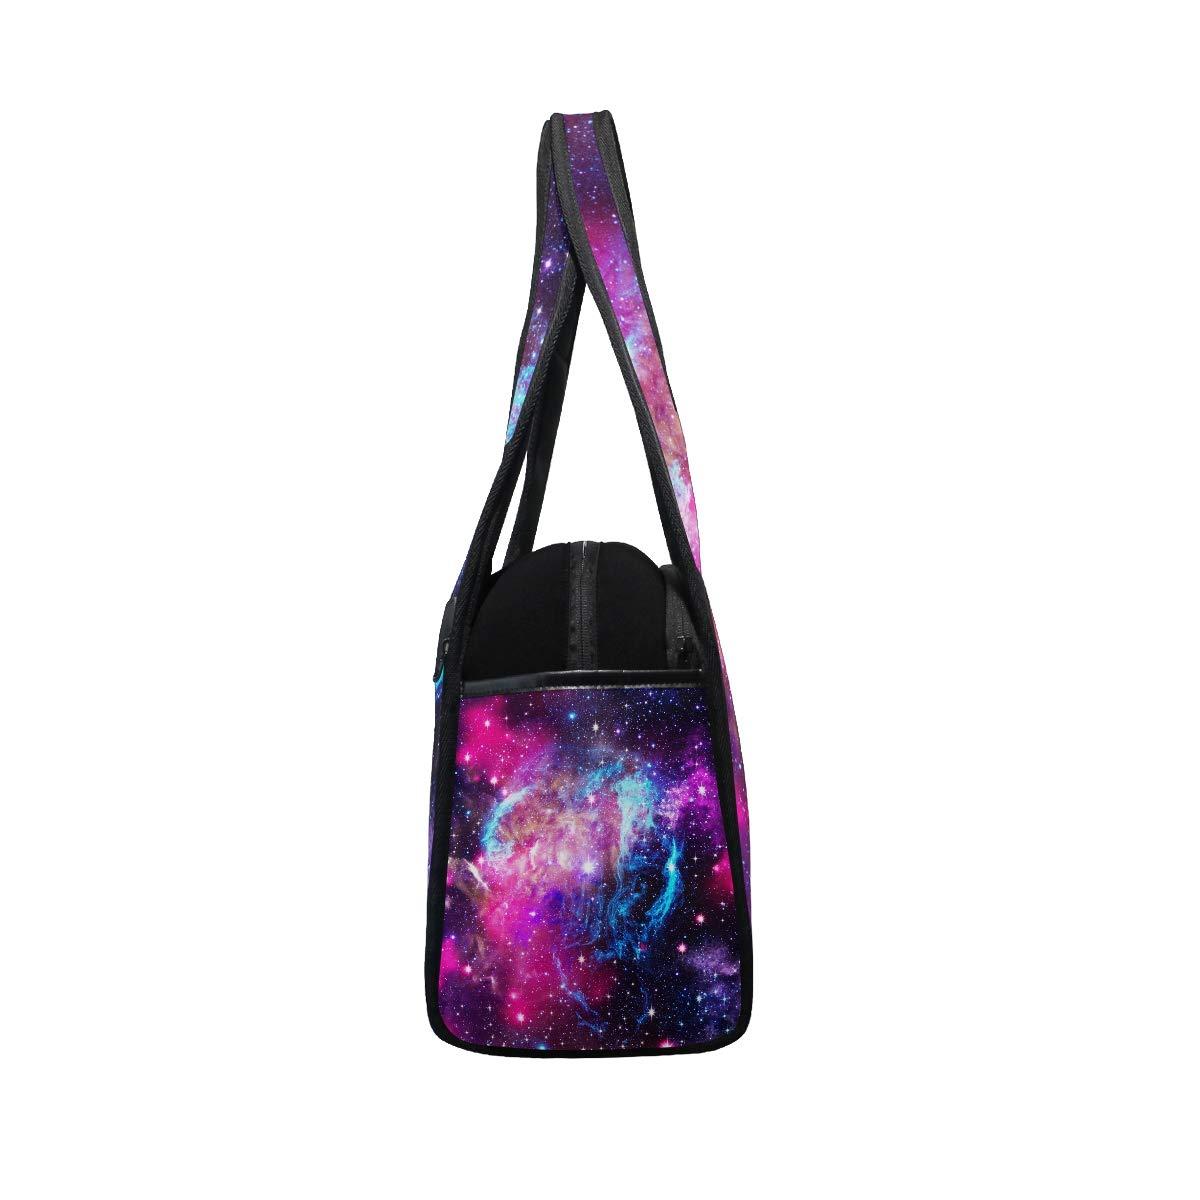 Unisex Travel Duffels Gym Bag Nebula Galaxy Universe Star Canvas Weekender Bag Shoulder Bag Totes bags